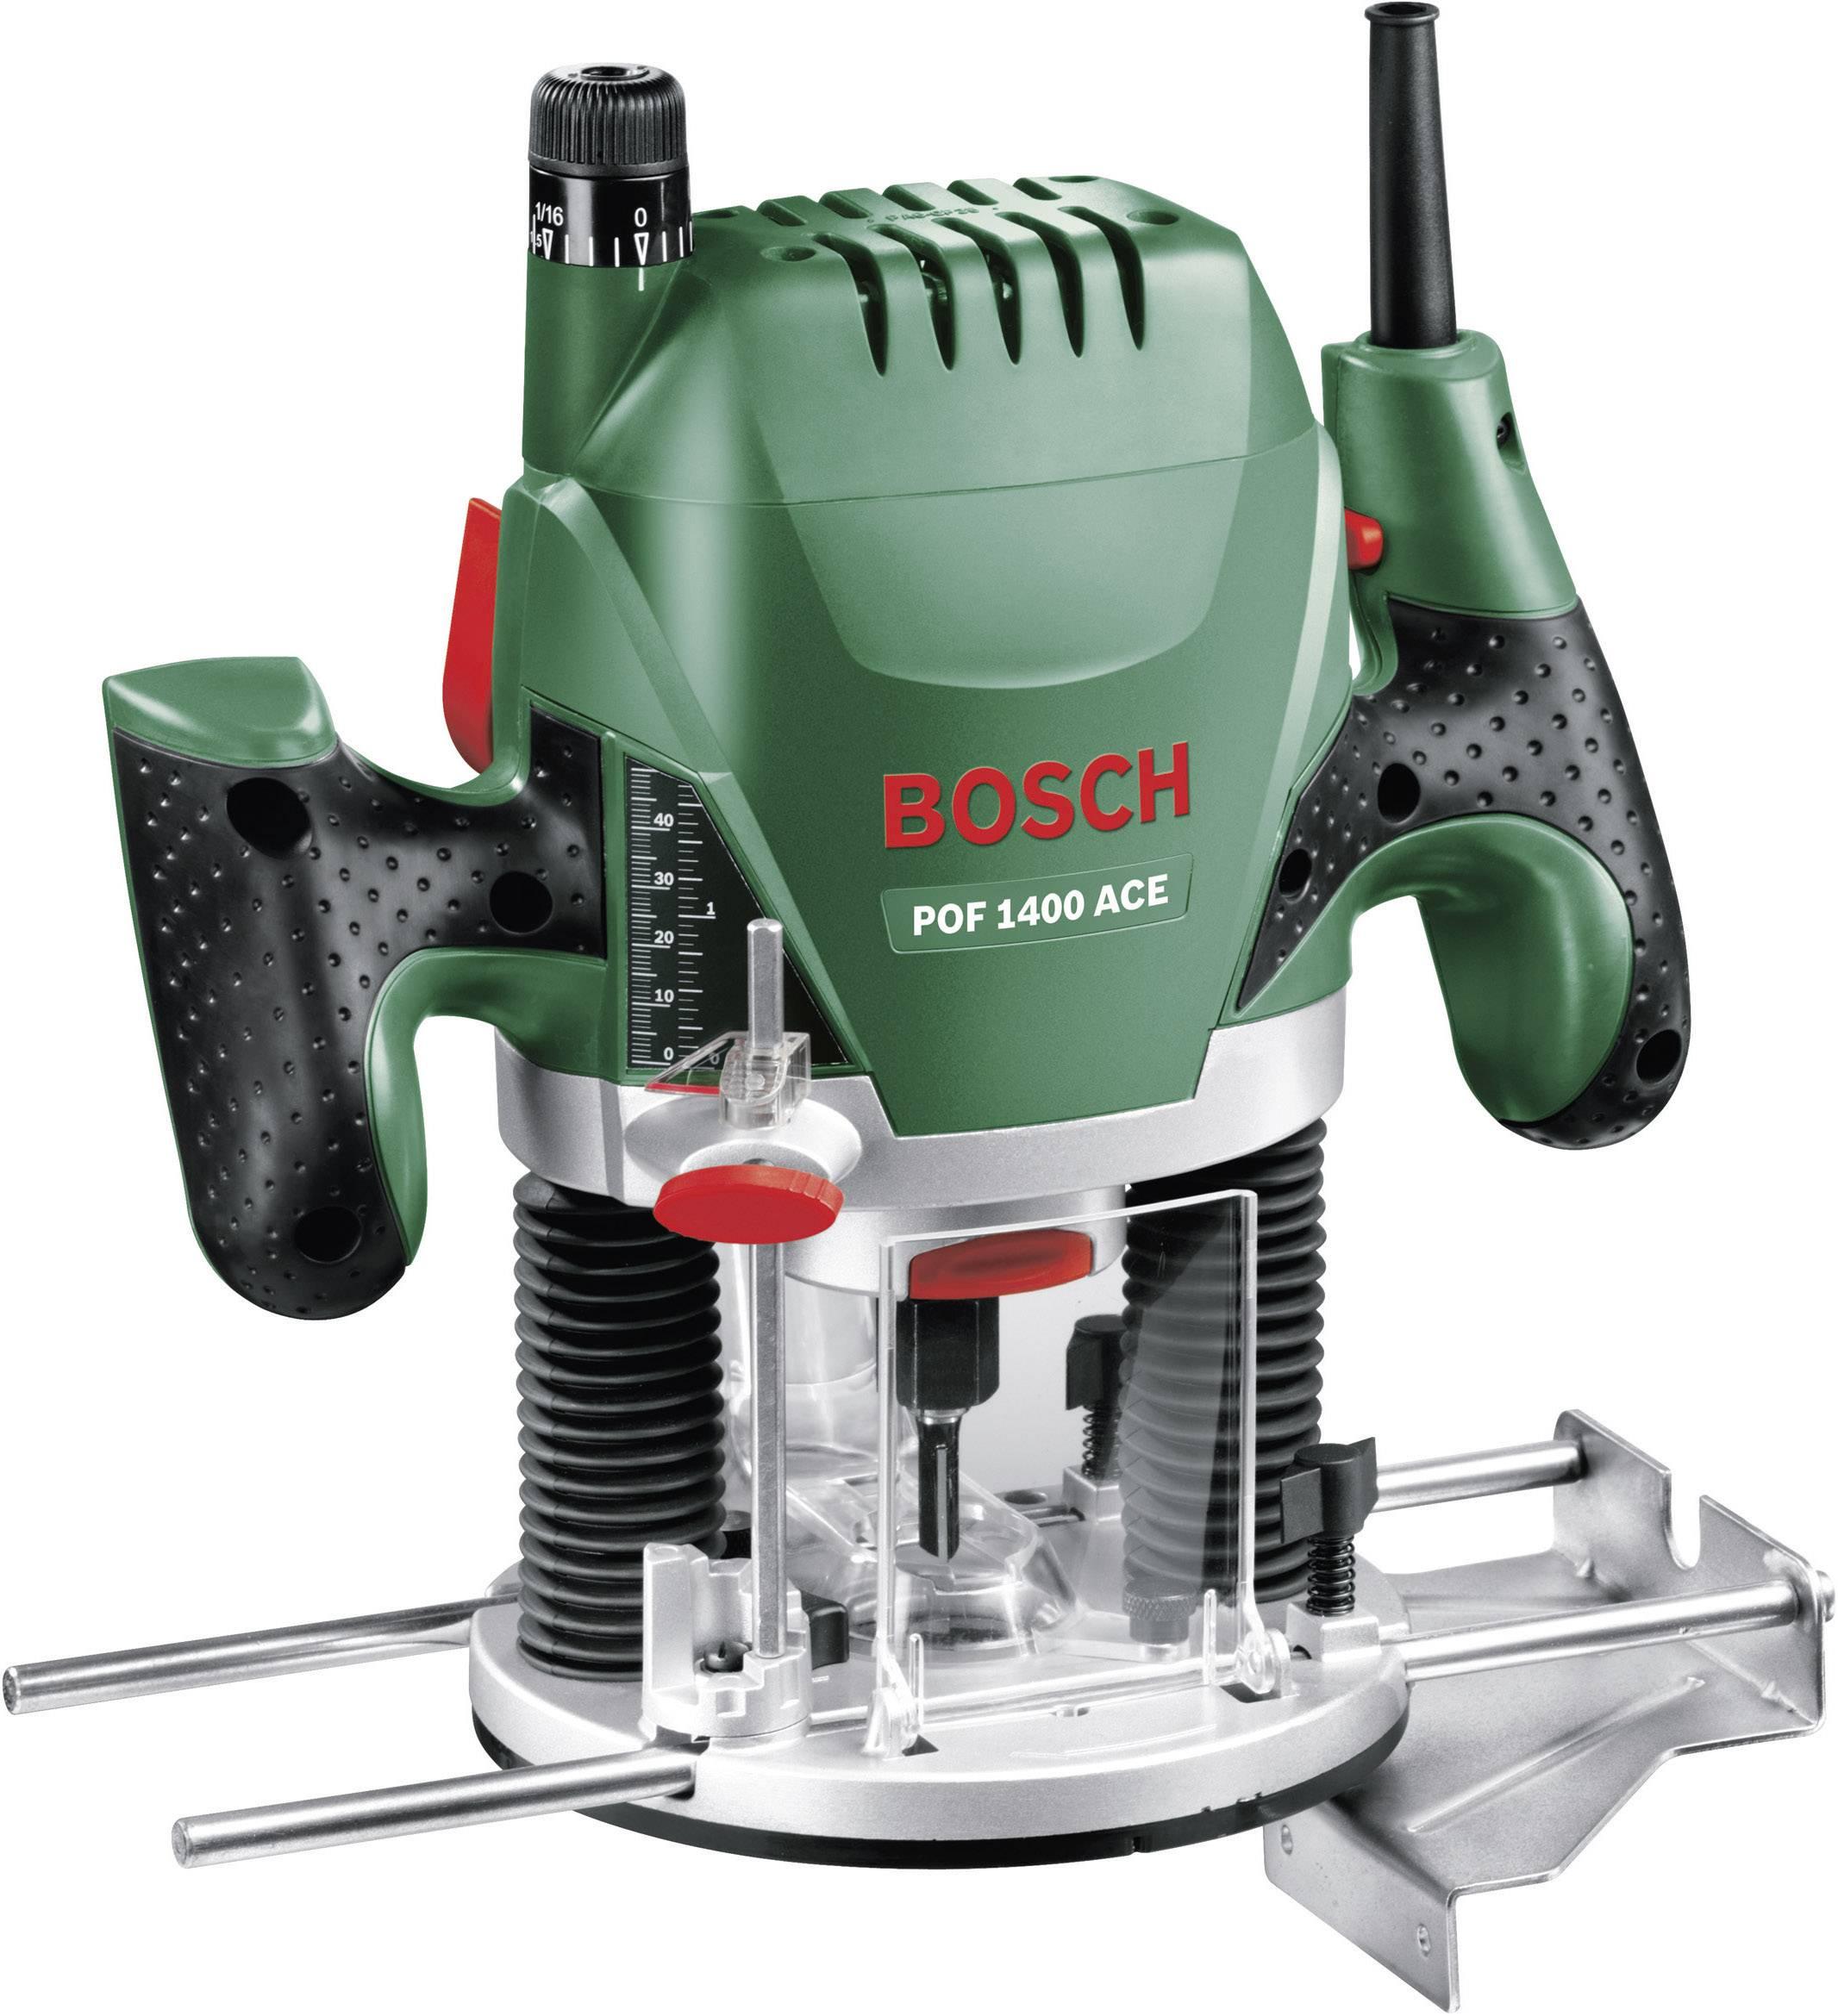 Bosch Home and Garden POF 1400